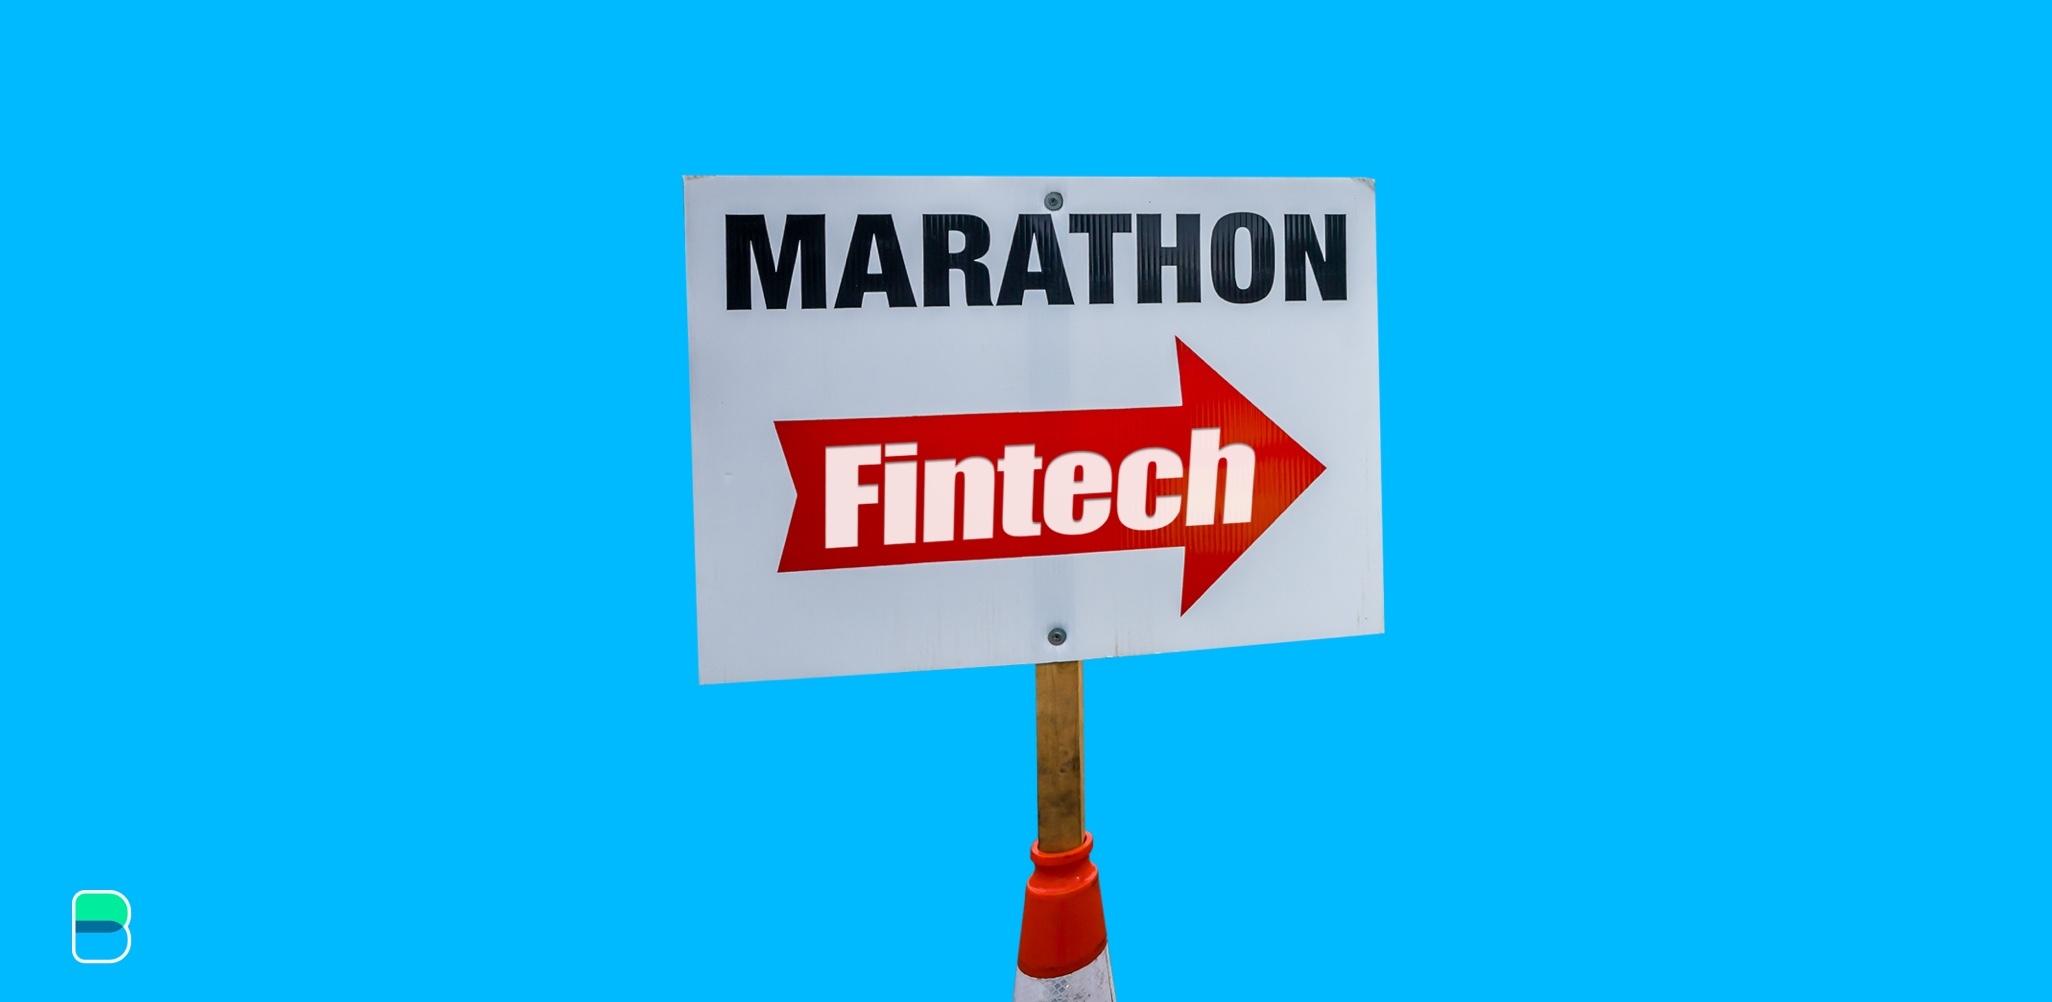 🏃Batelco joins the FinTech marathon